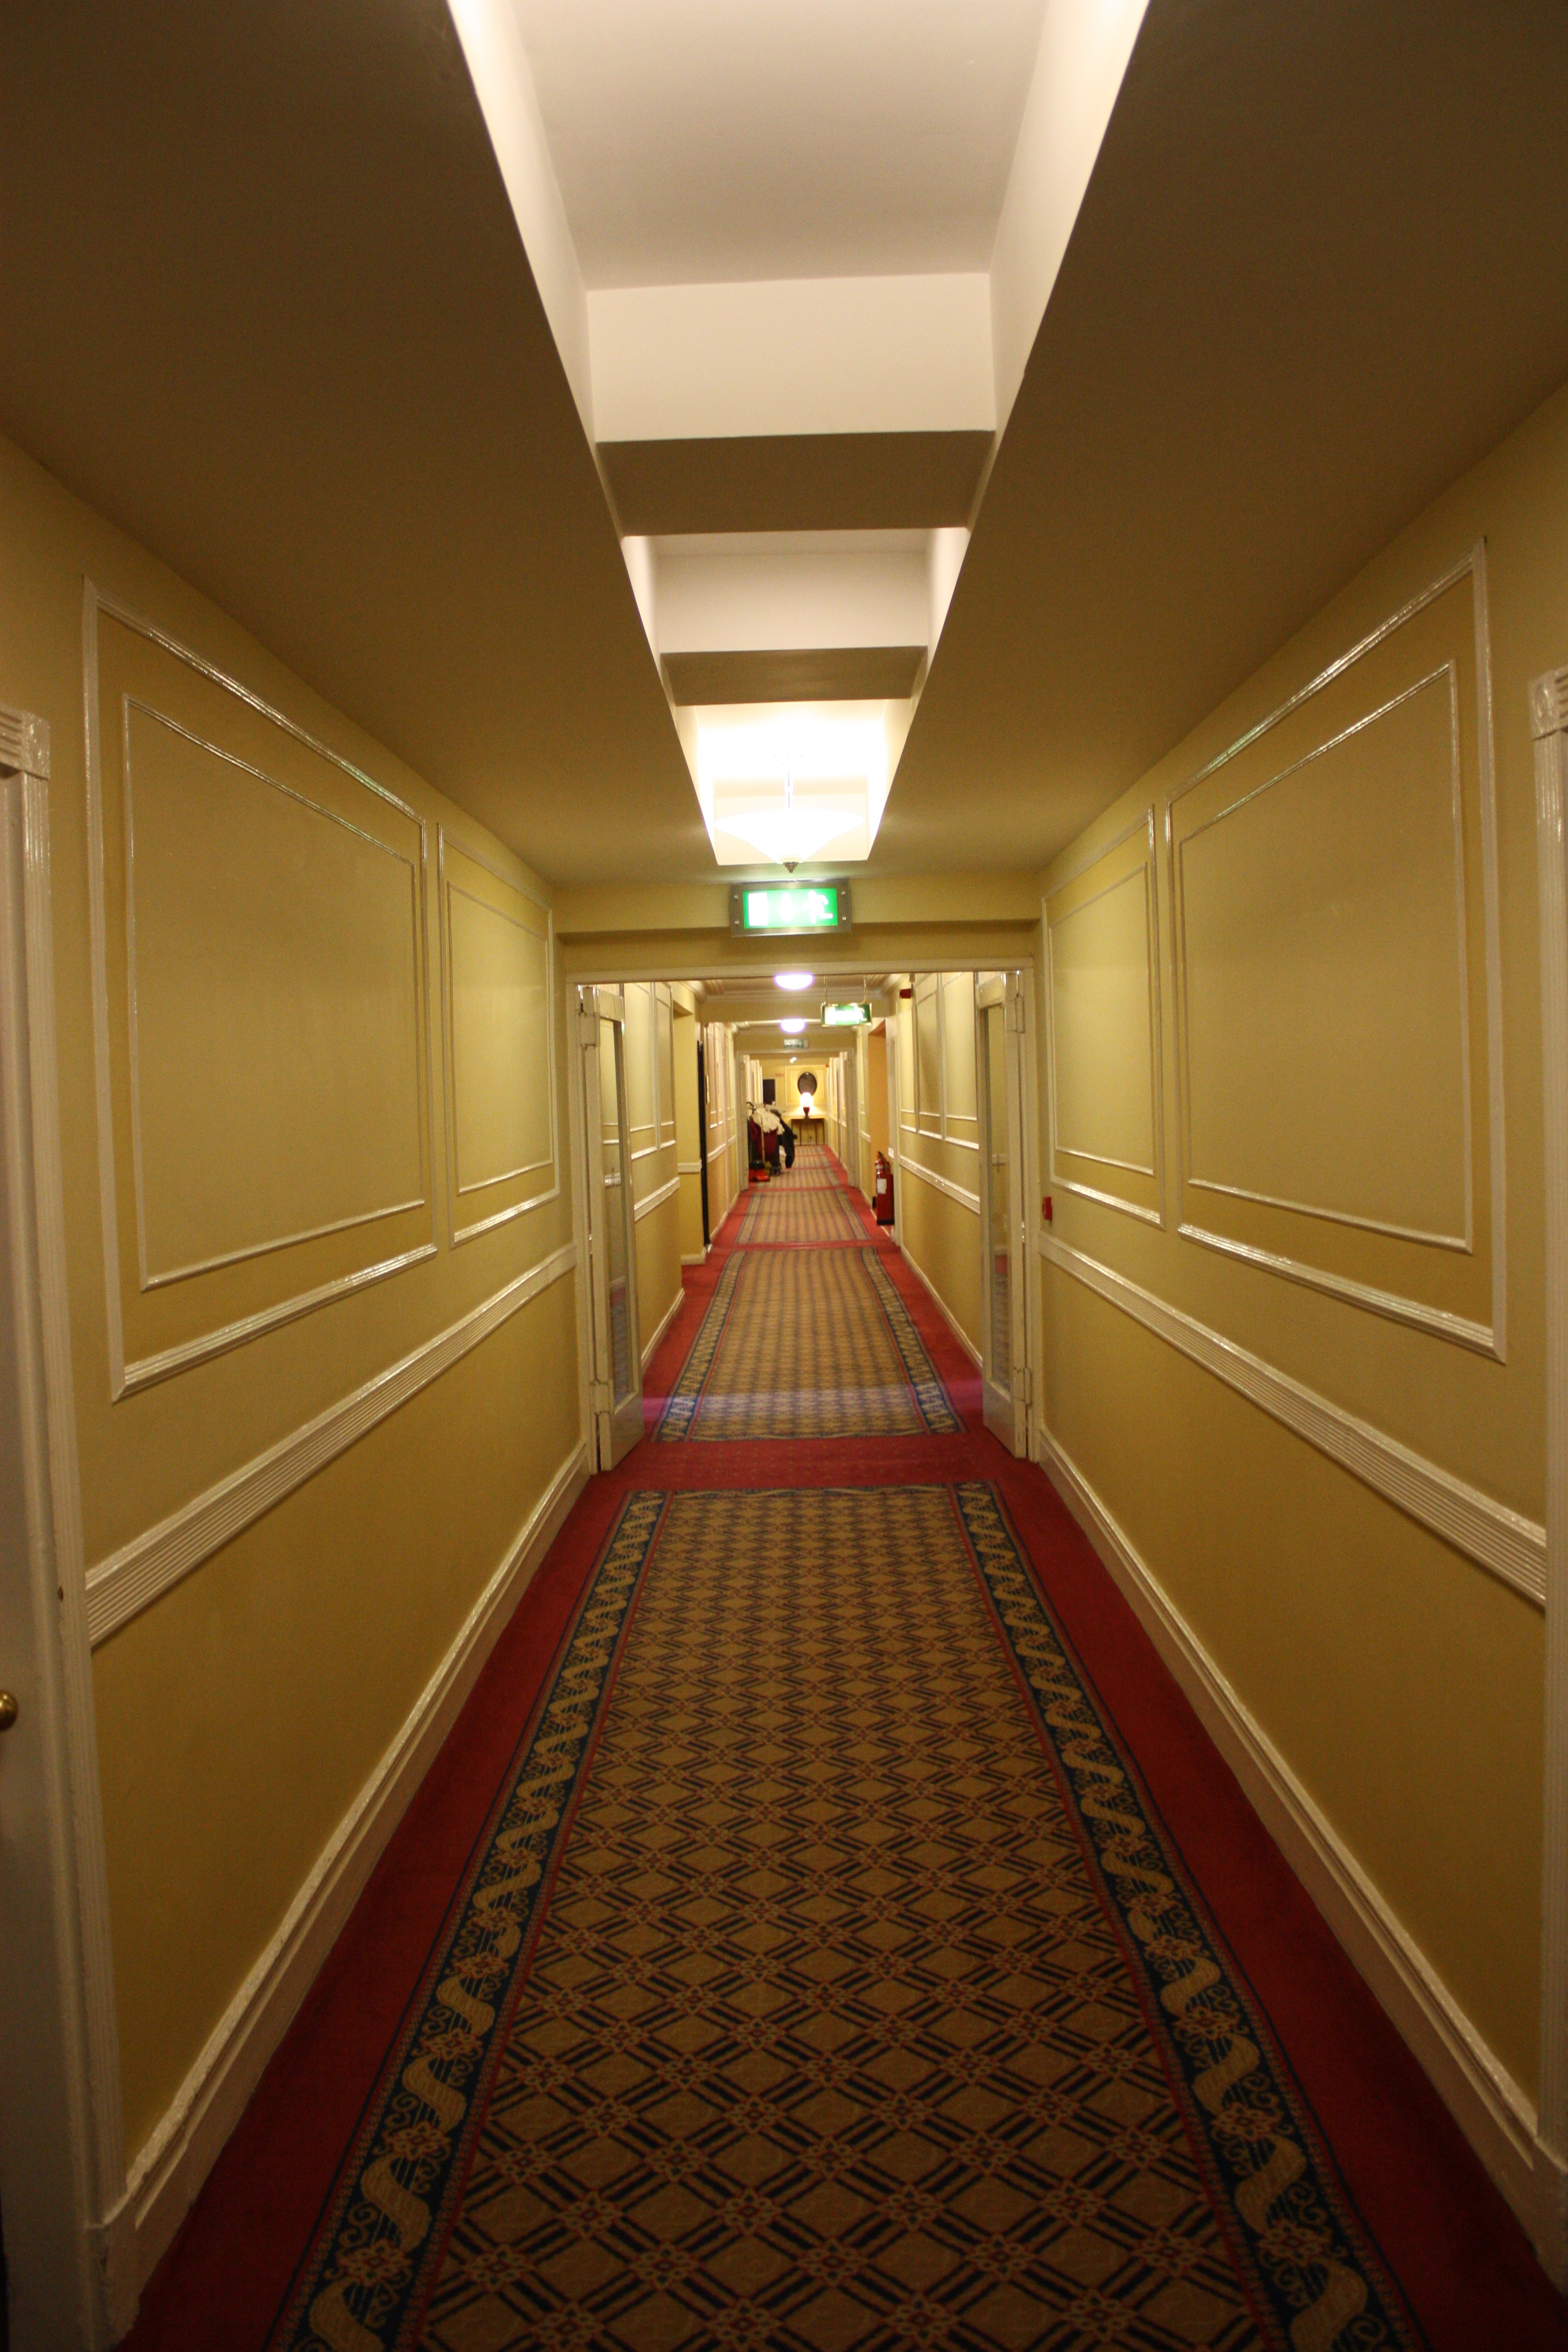 File:Gresham Hotel, Dublin, October 2010 (02).JPG ...